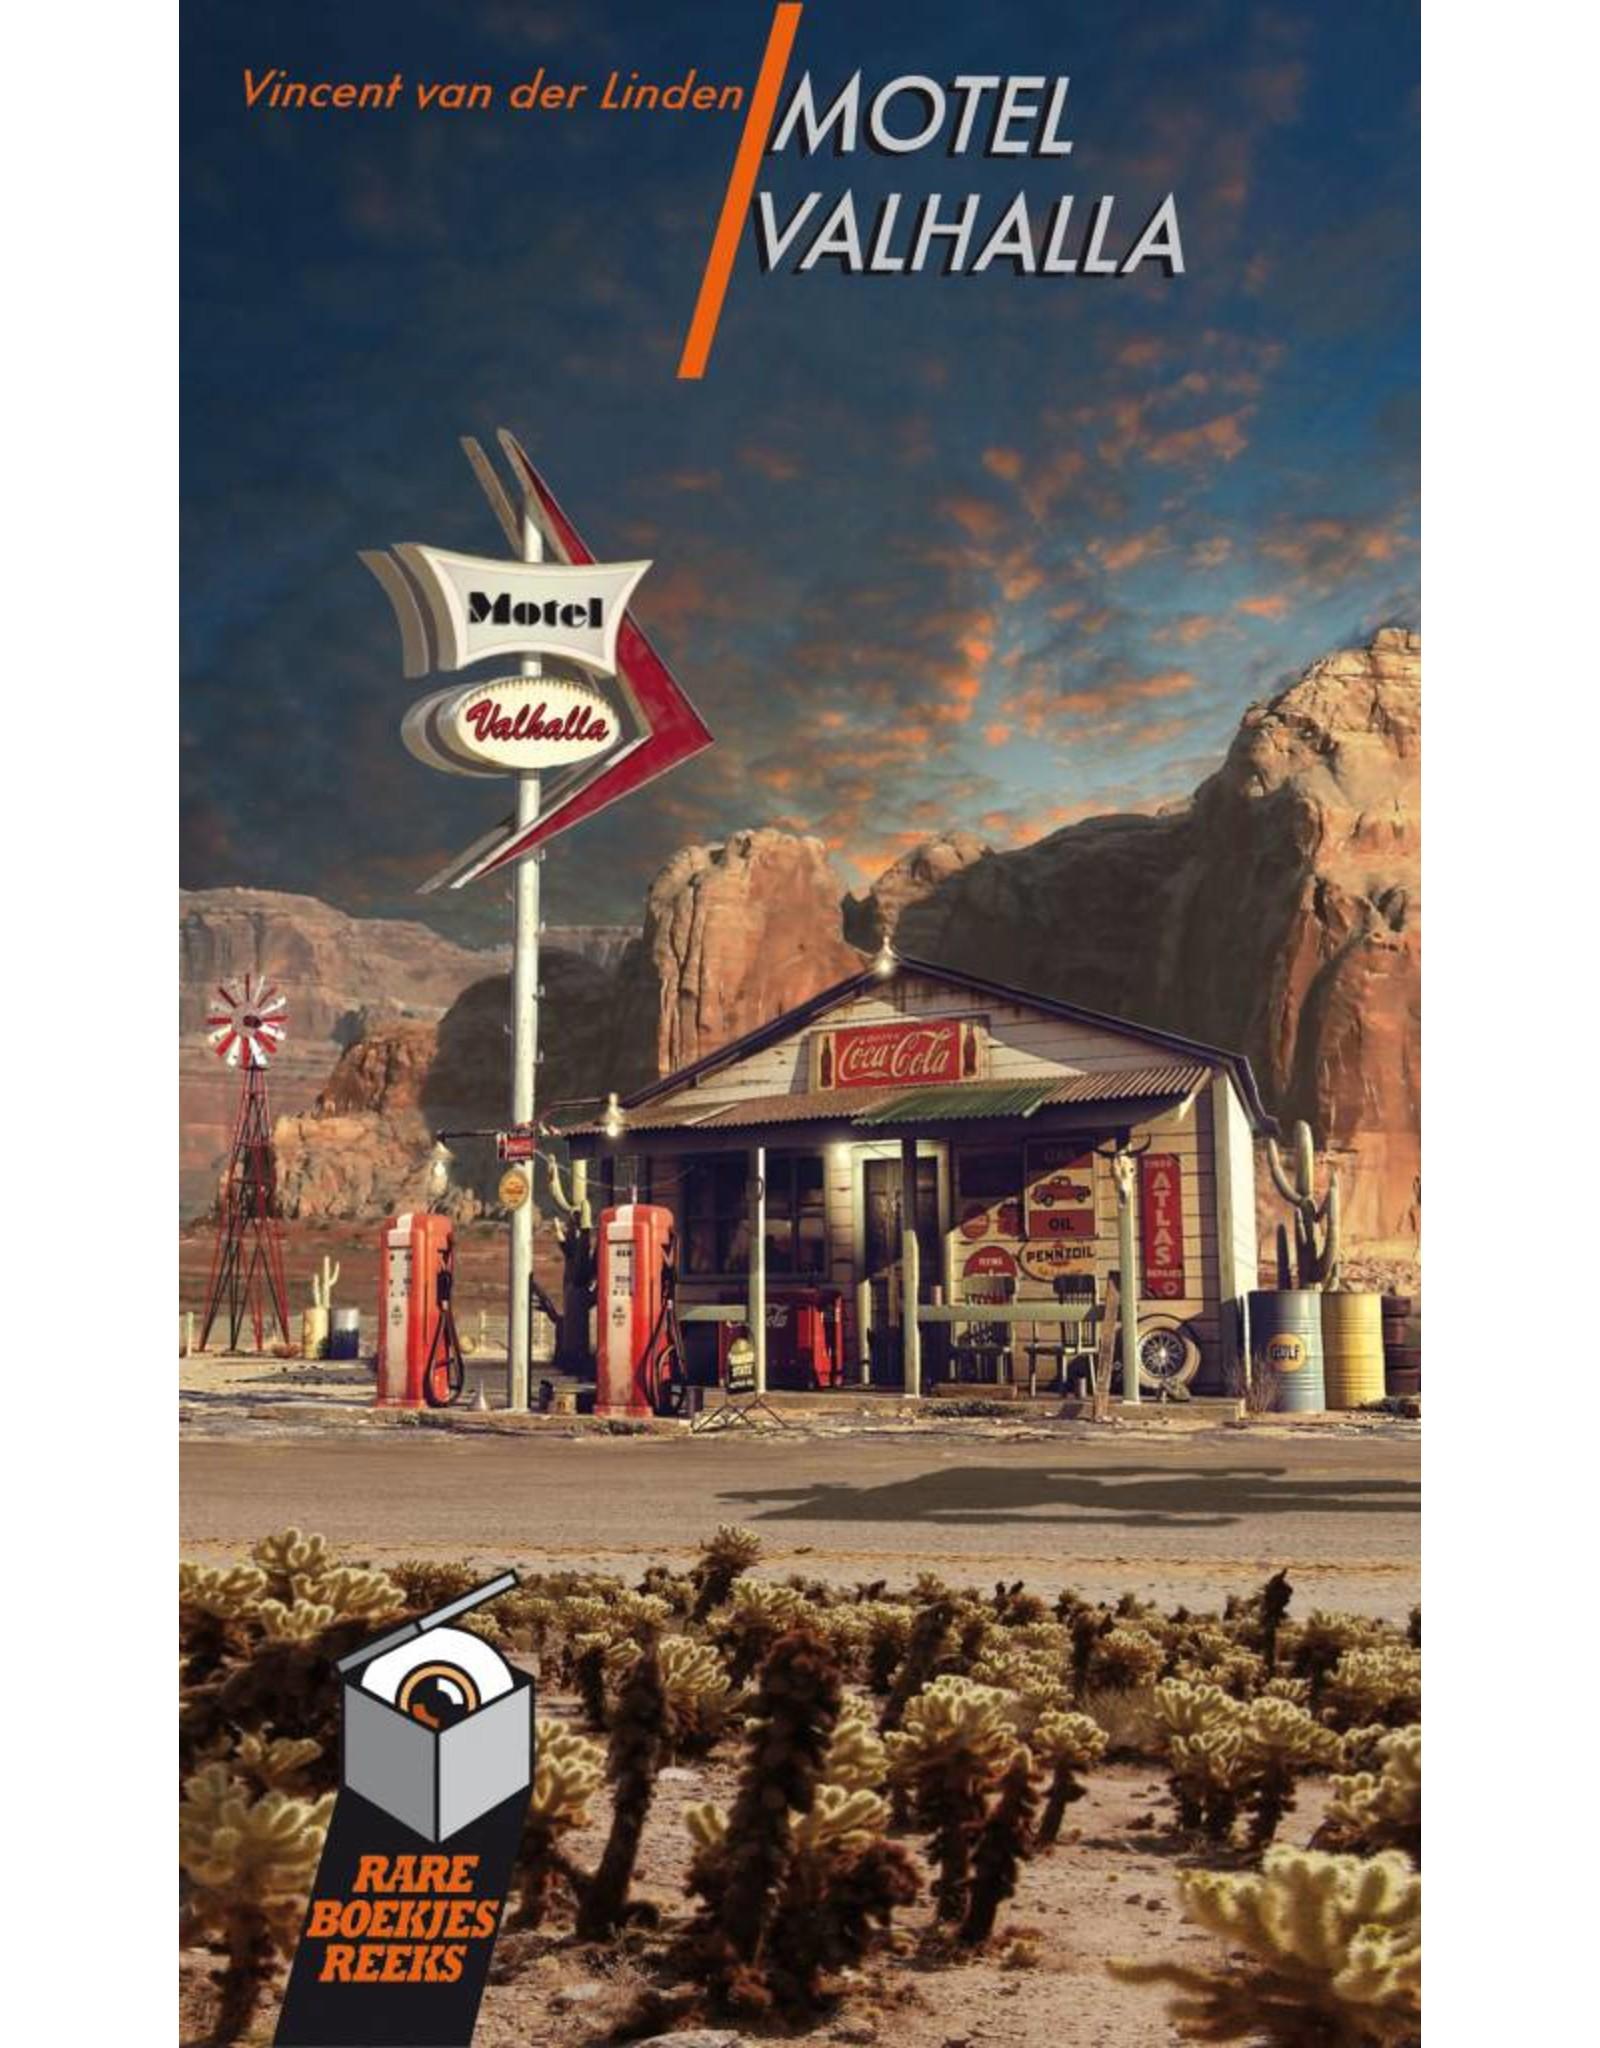 Motel Valhalla (Vincent van der Linden)